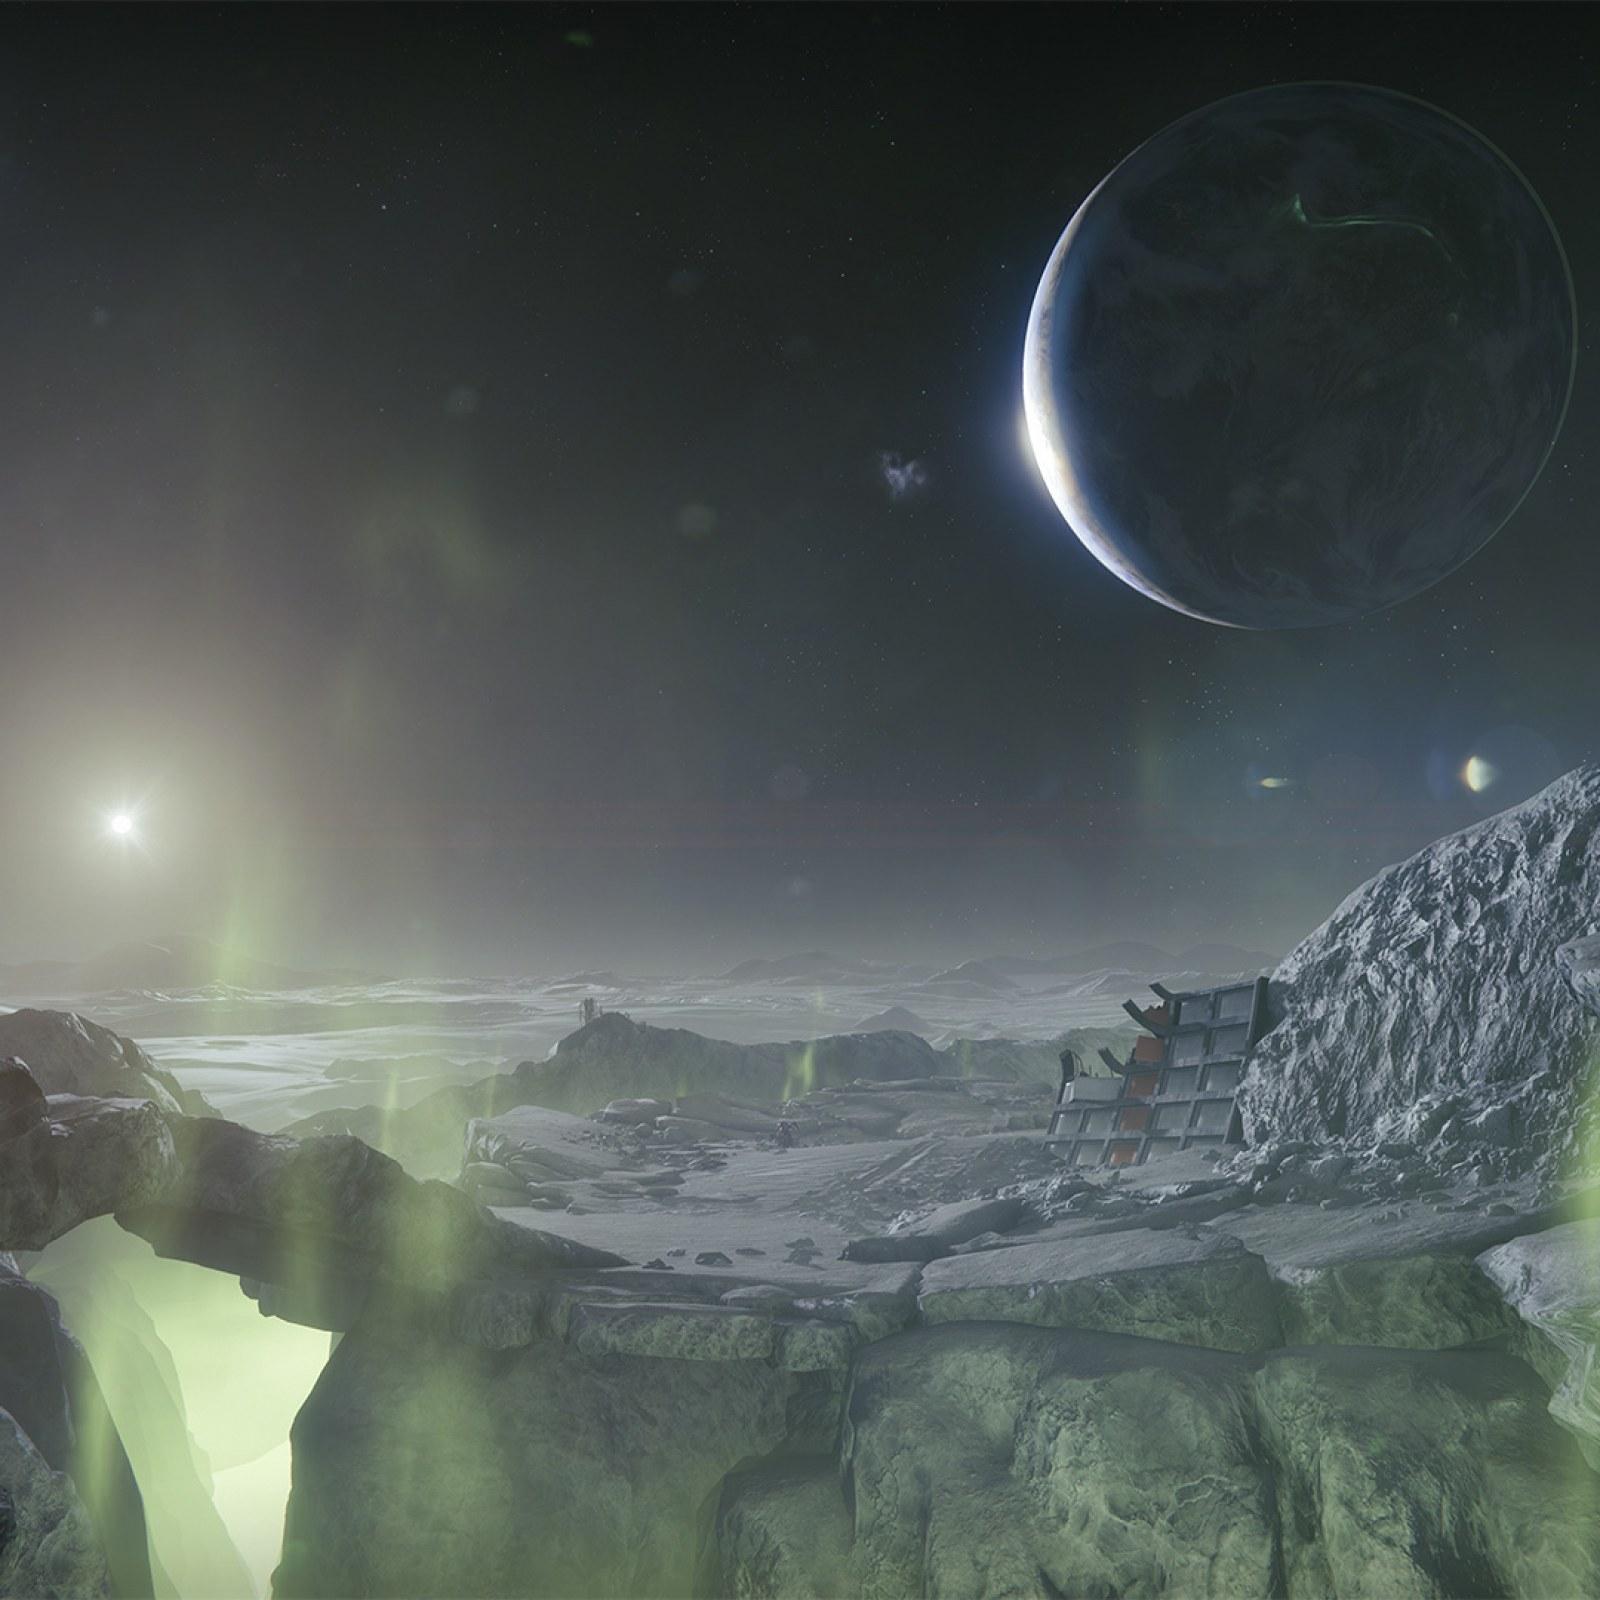 Destiny 2' Shadowkeep Pre-Order Guide: Deluxe & Collector's Edition